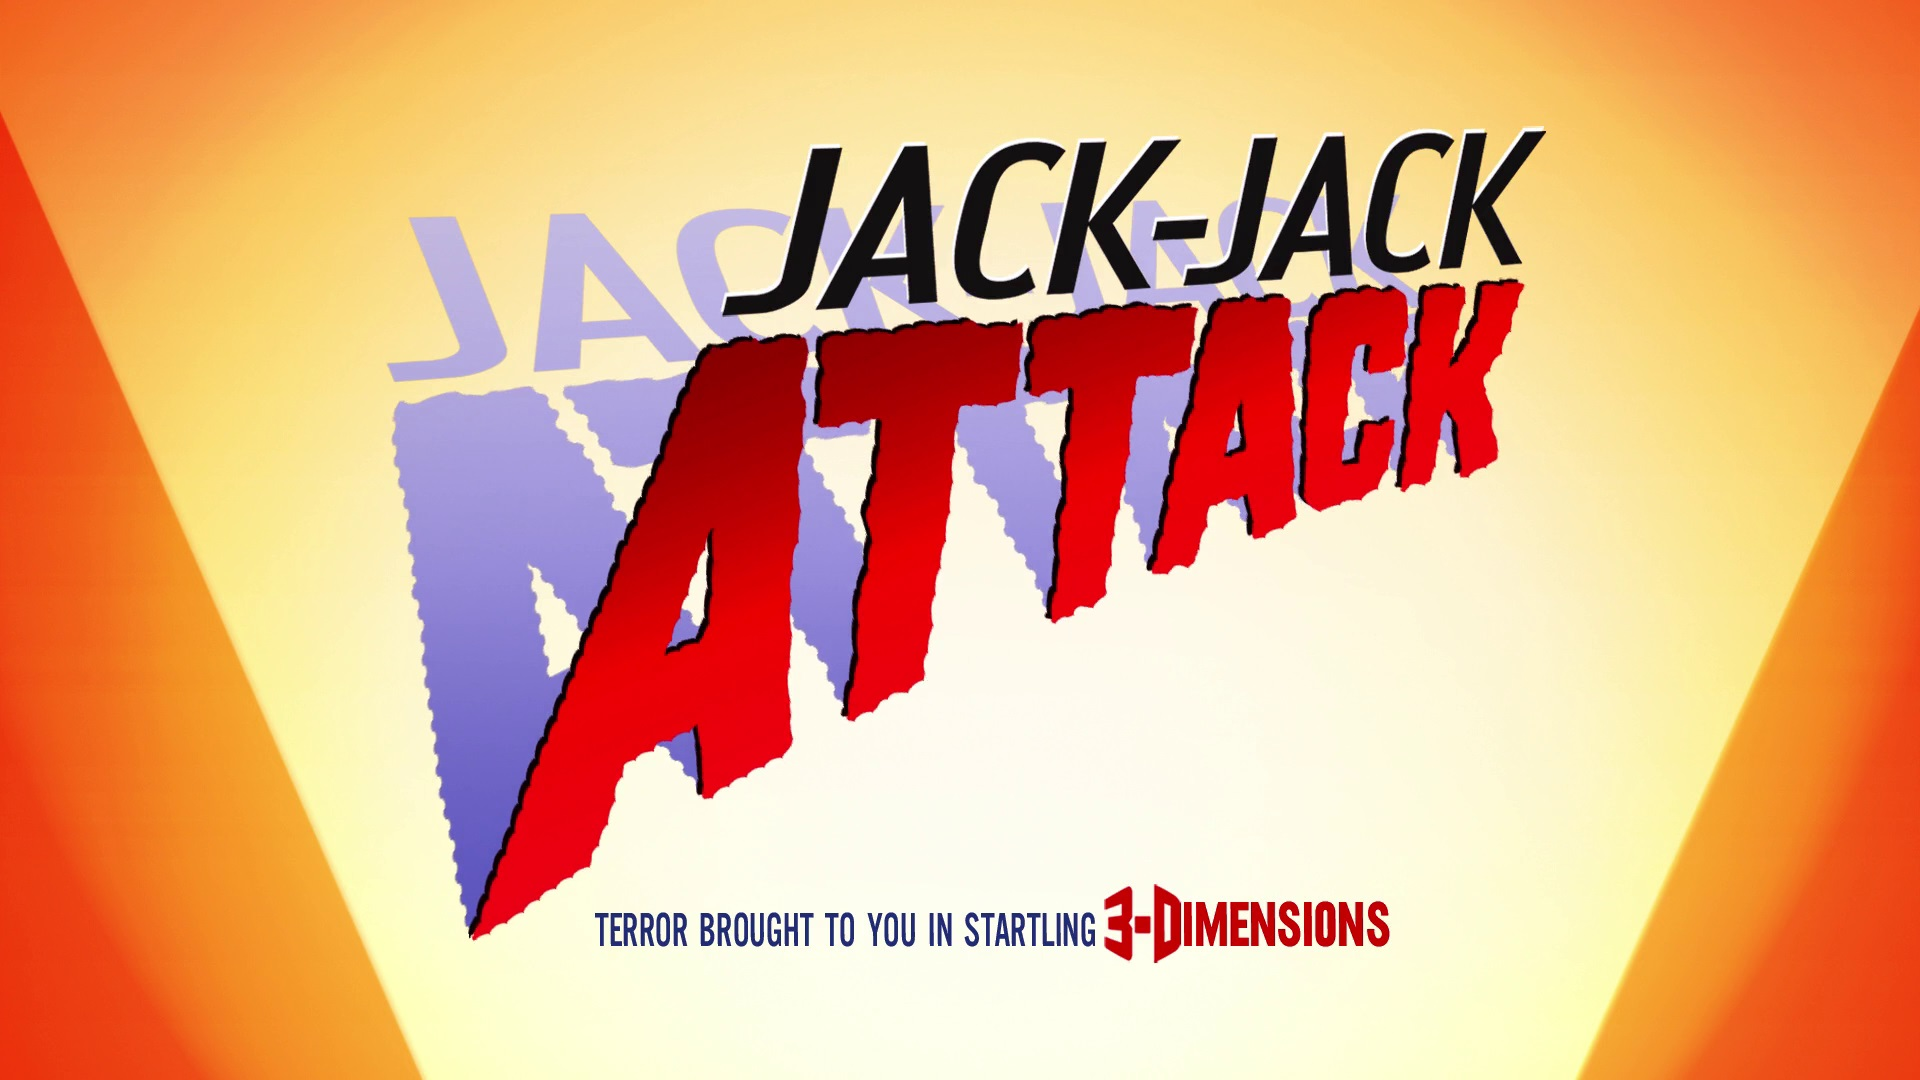 File:Title-jackjackattack.jpg